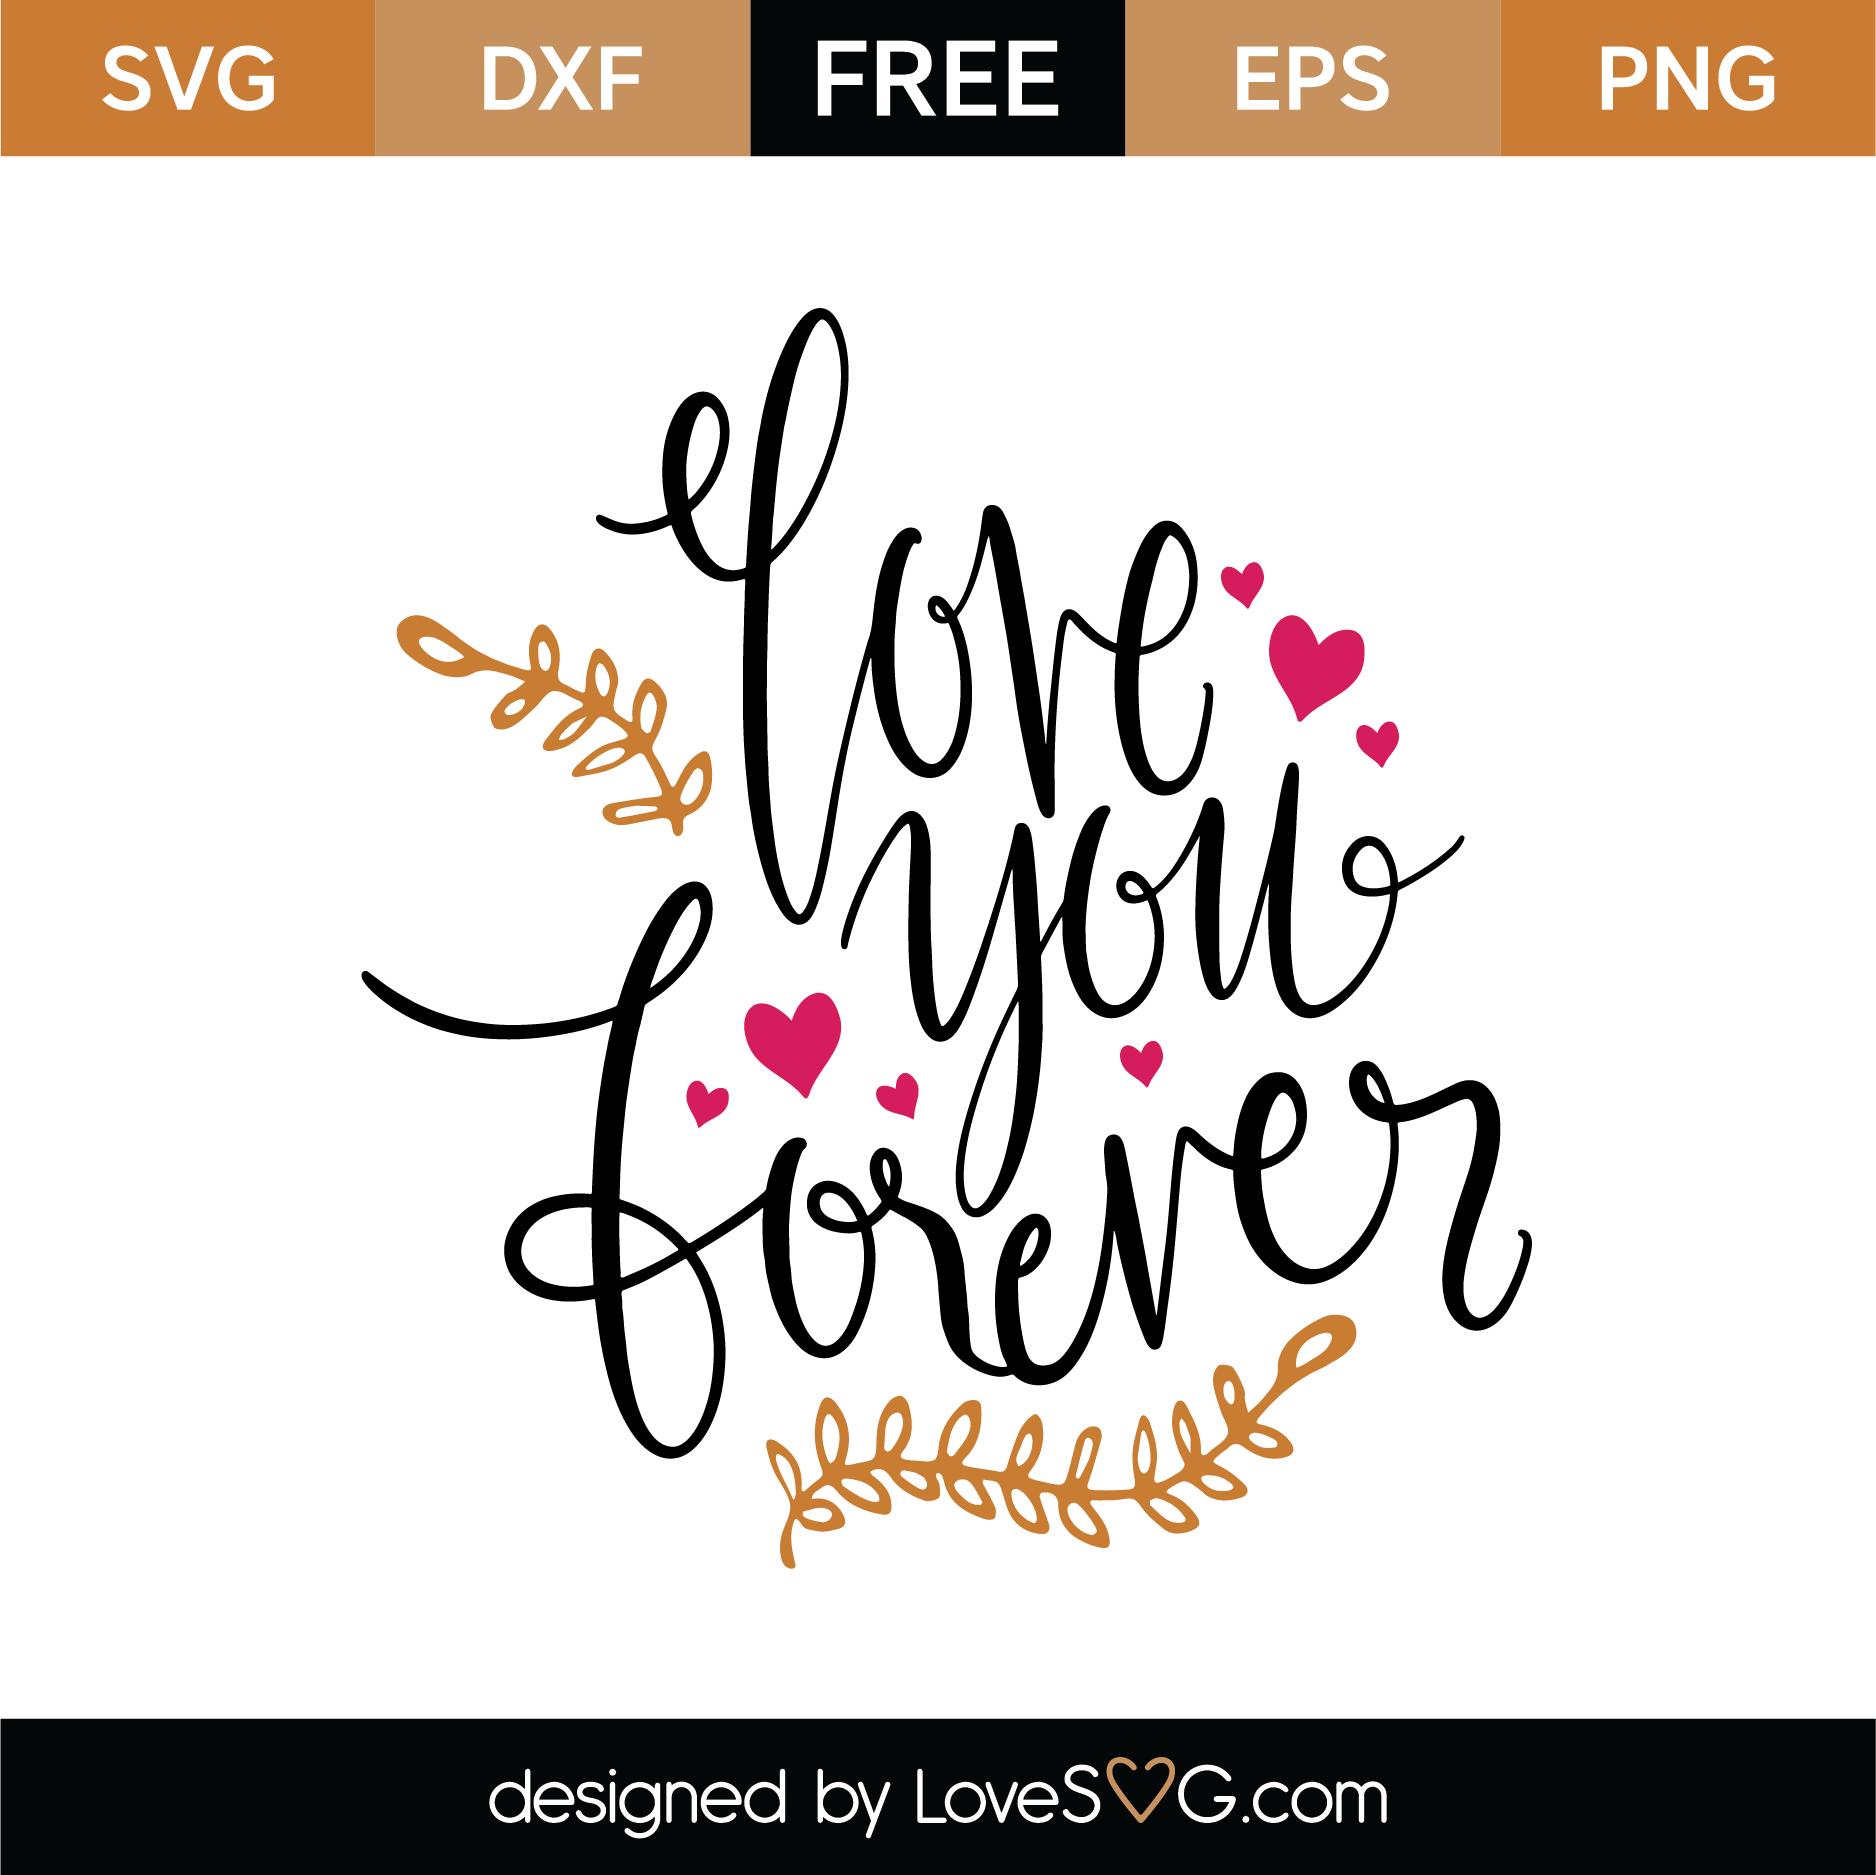 Download Free Love You Forever SVG Cut File   Lovesvg.com